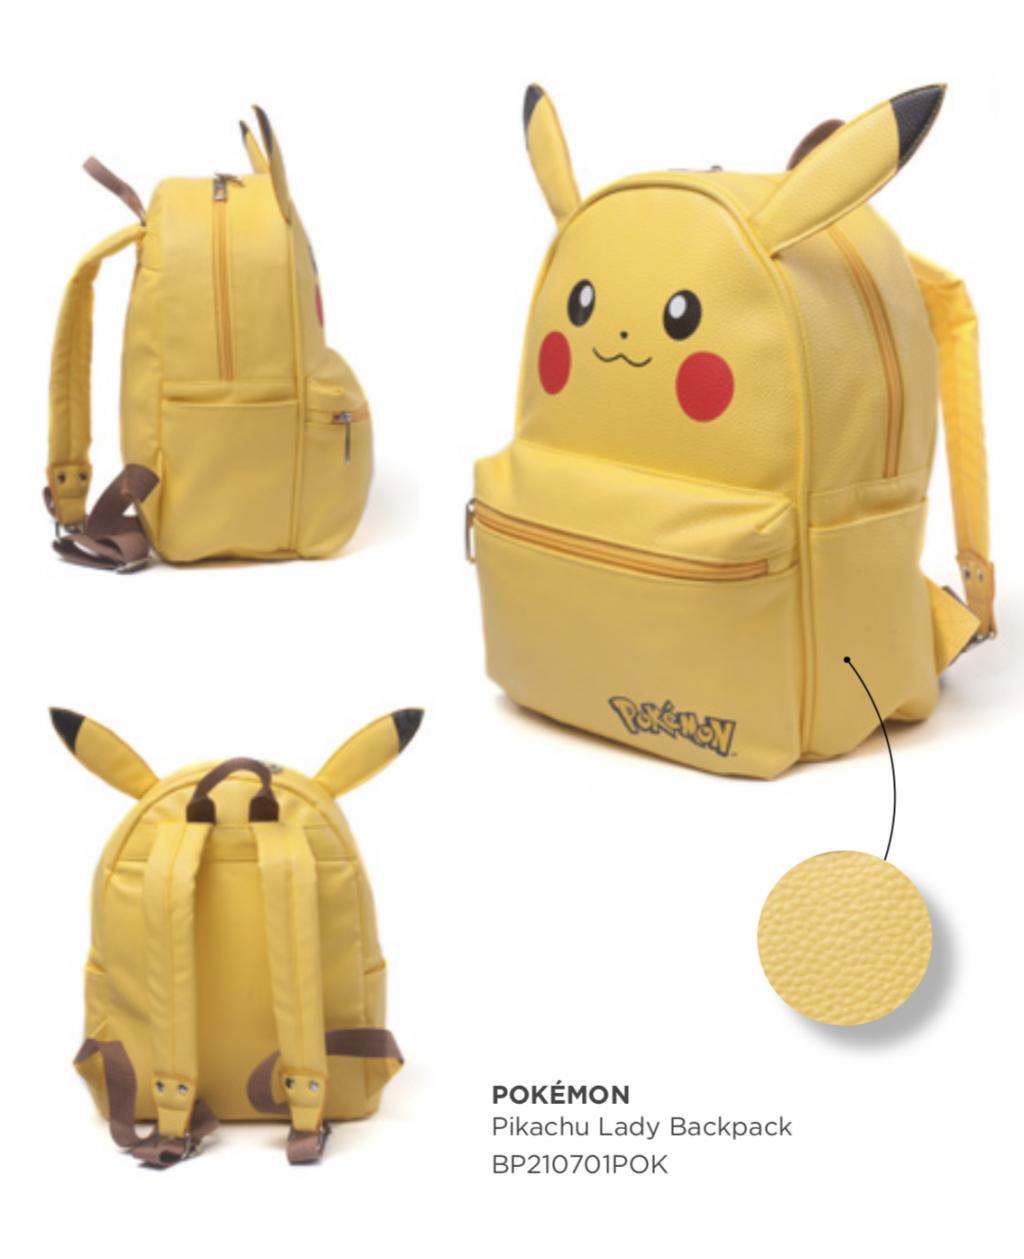 POKEMON - Lady Backpack - Pikachu_2